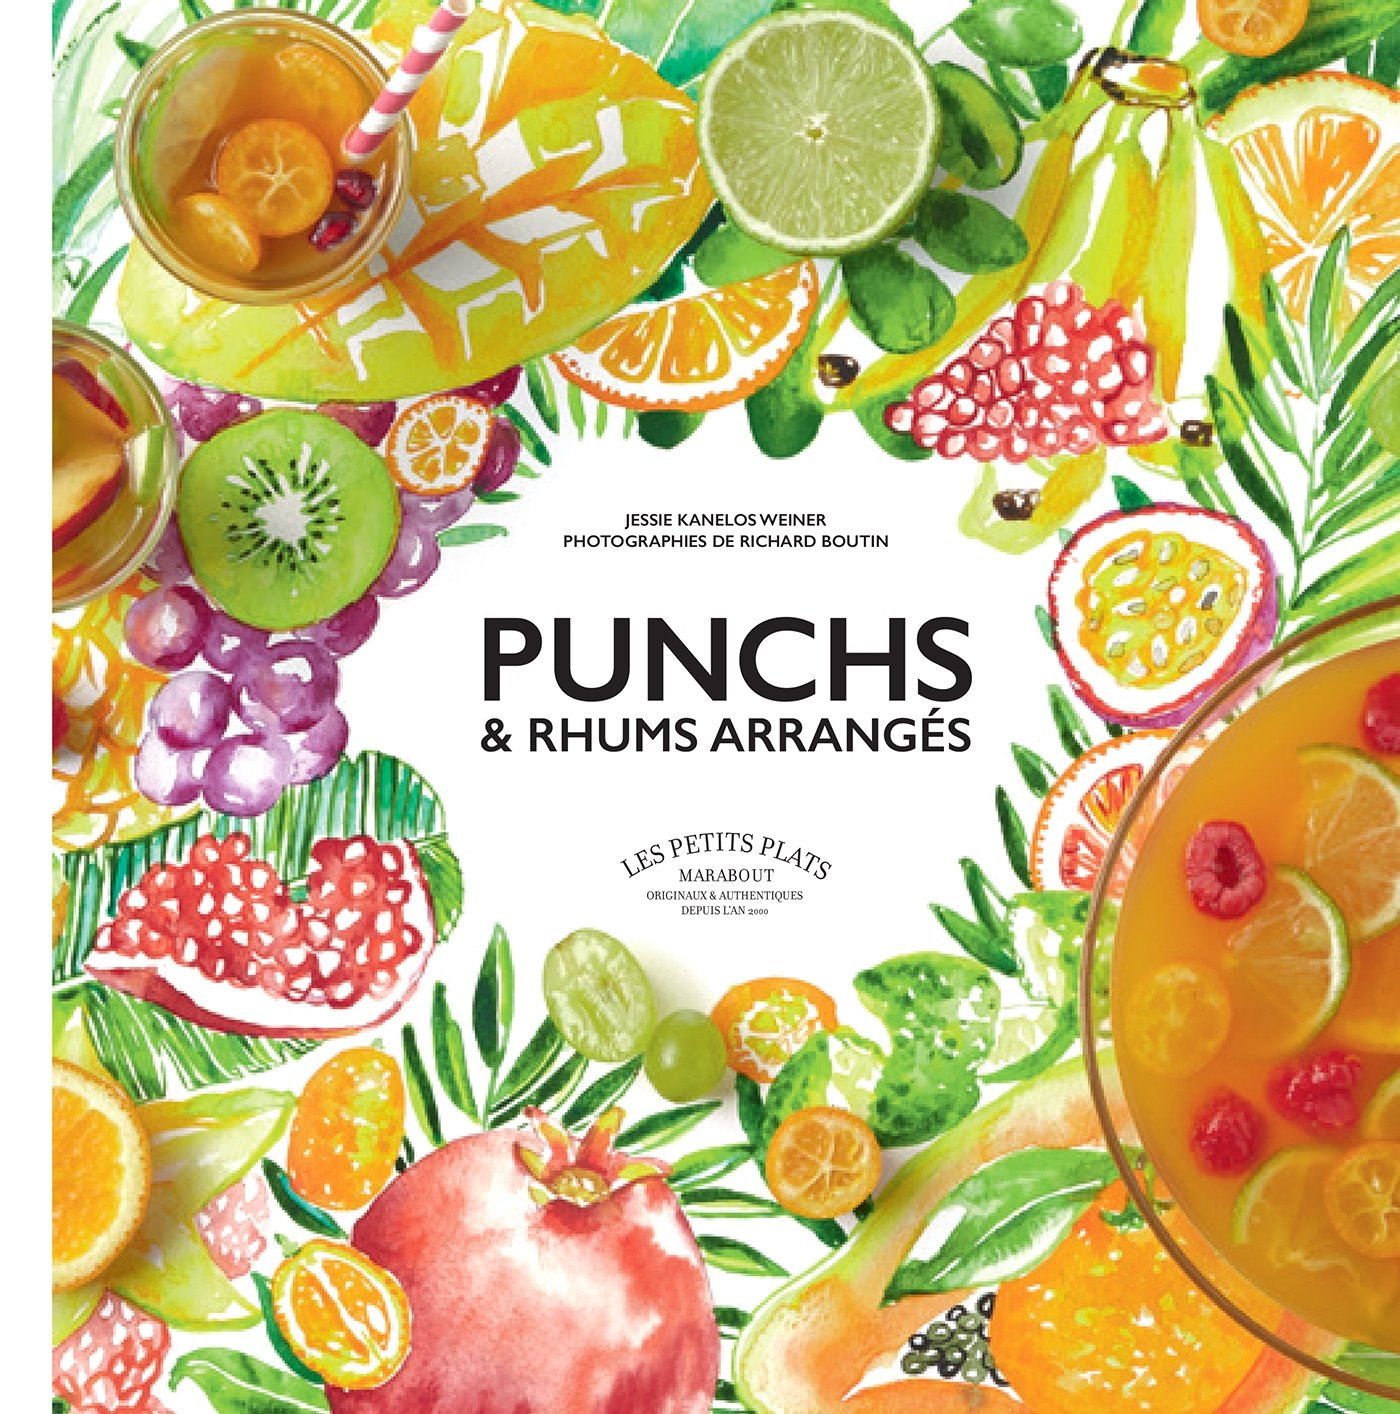 Punchs et rhums arrangés Broché – 4 novembre 2015 Jessie Kanelos Weiner Richard Boutin Marabout 2501109554